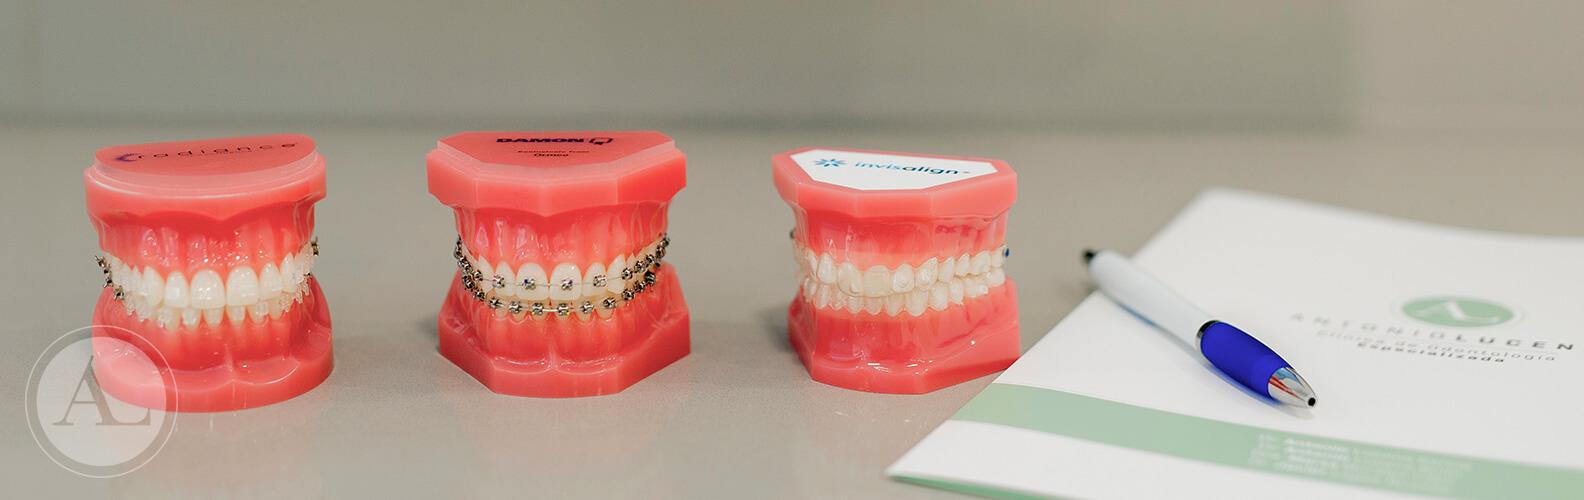 ortodoncia-tipos